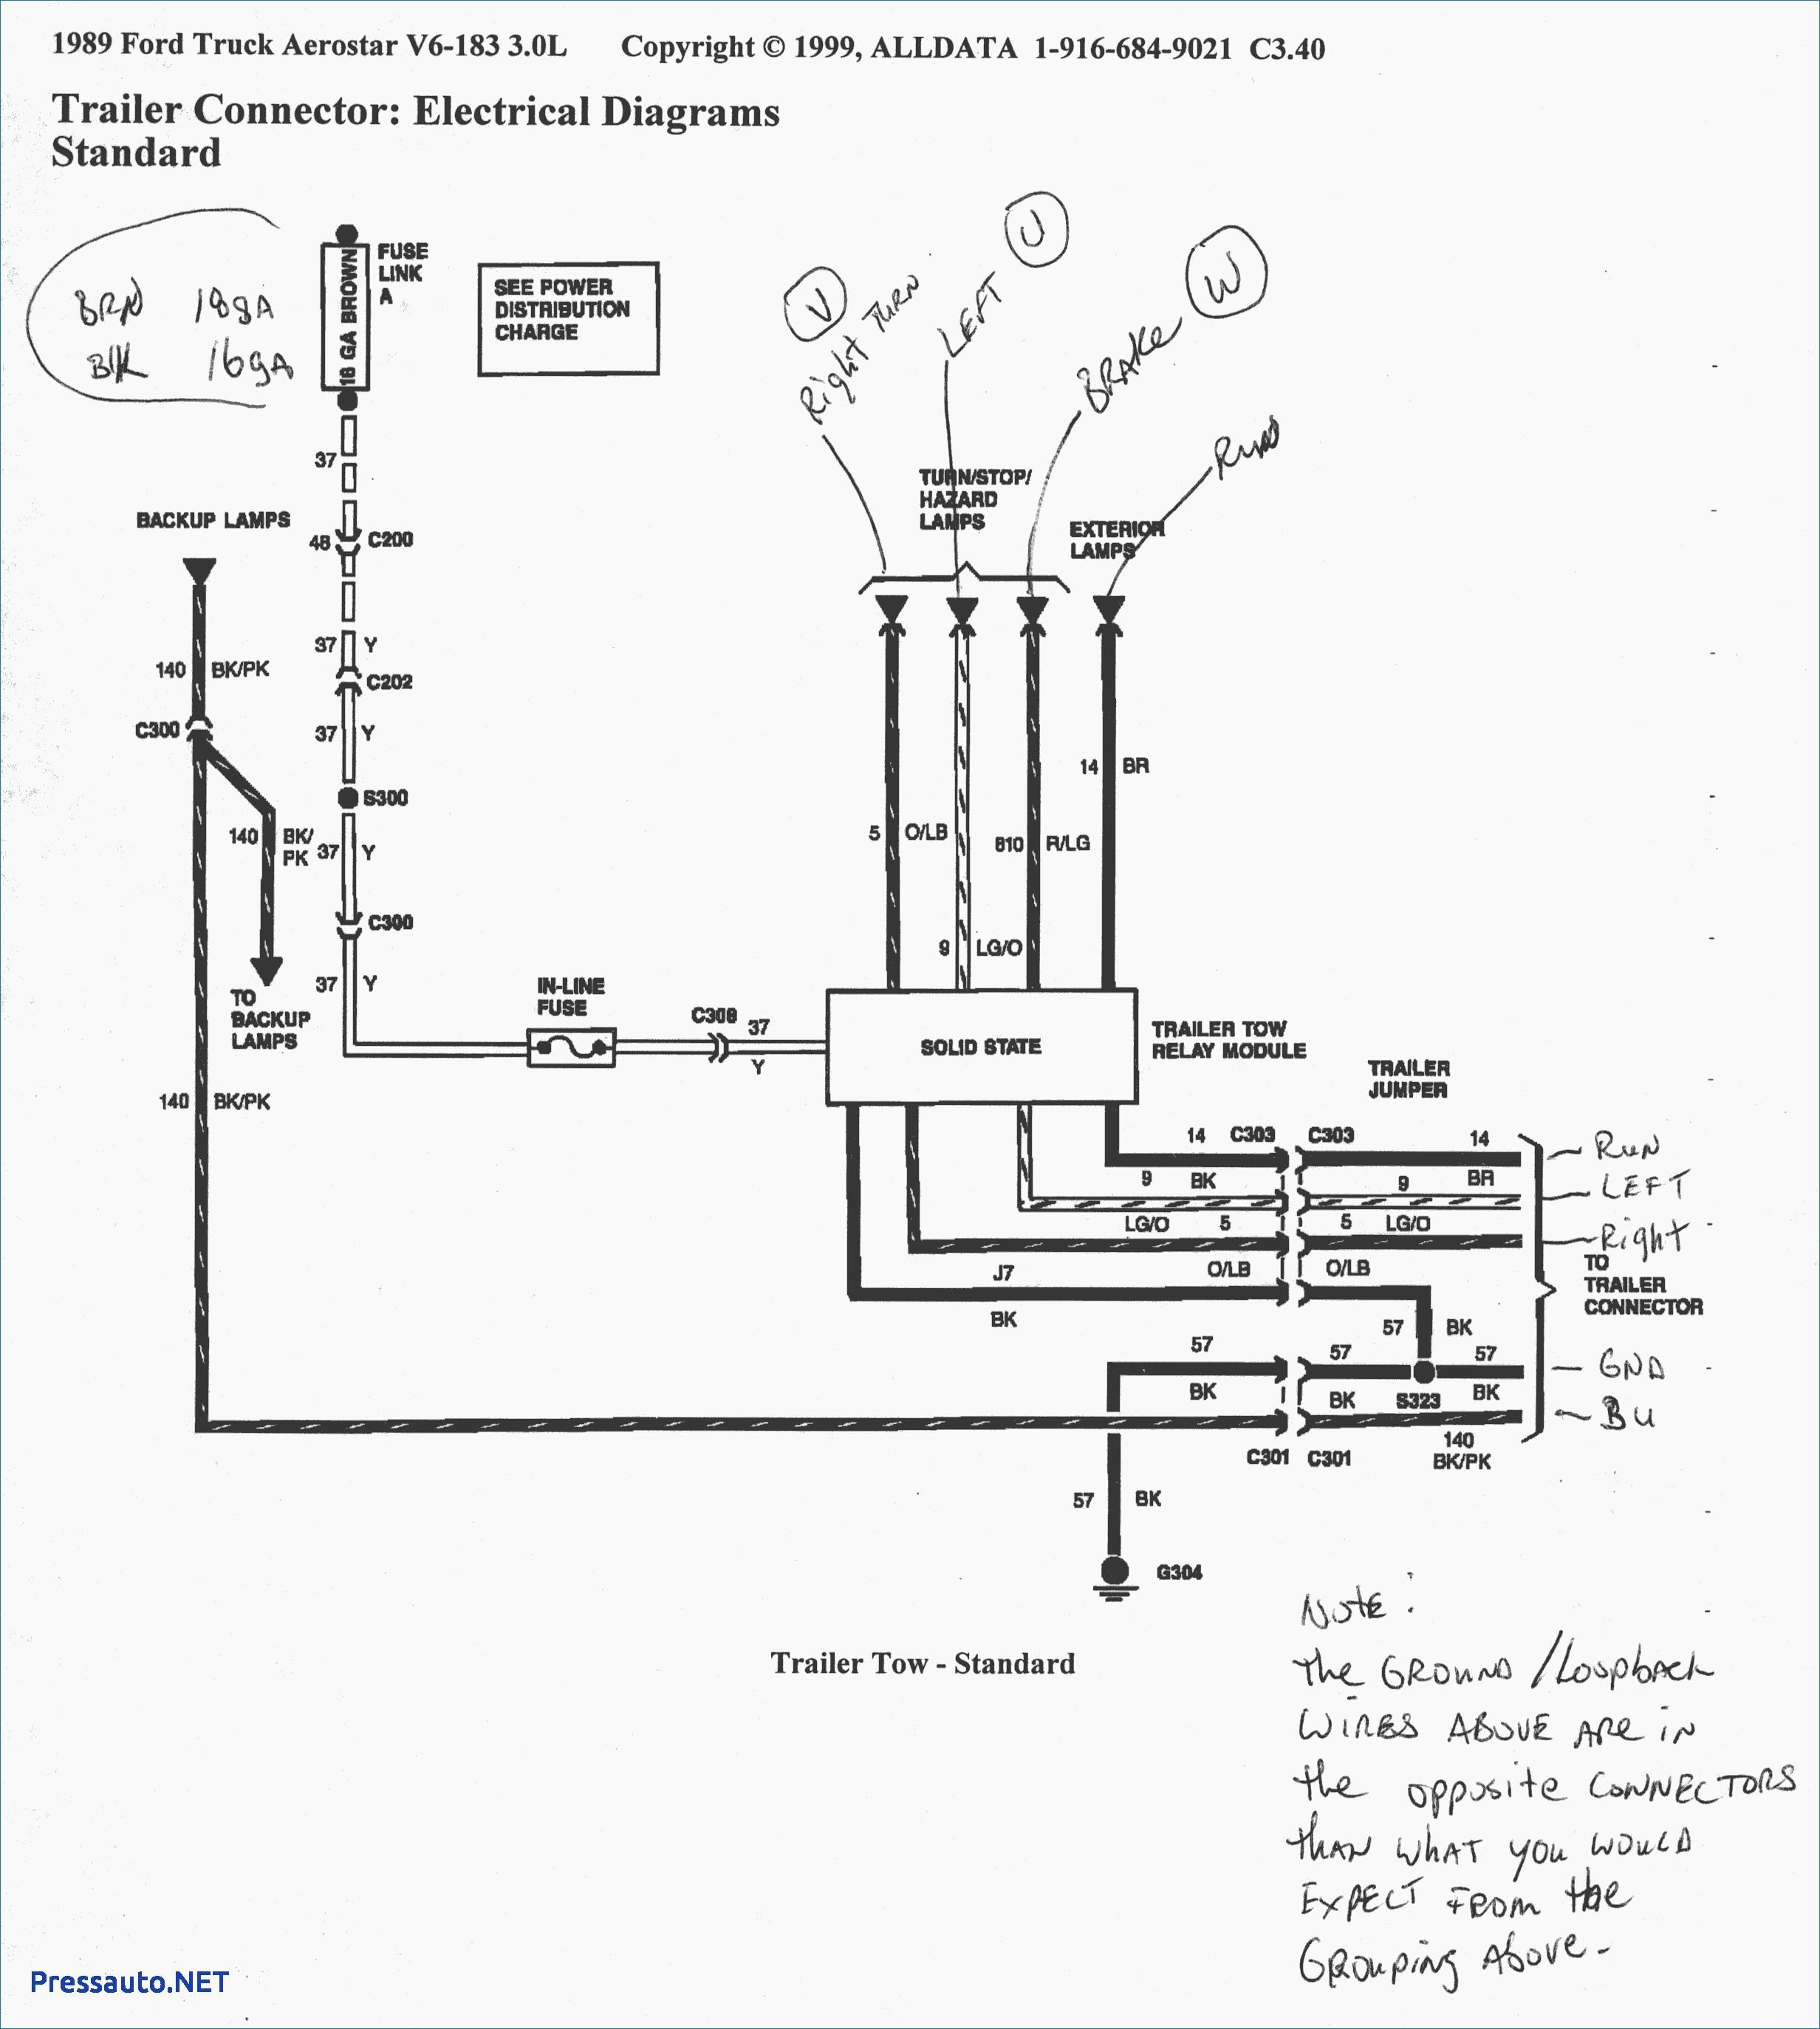 1995 Ford F150 Starter Wiring Diagram Elegant 95 F150 Starter Wiring - Starter Wiring Diagram Ford